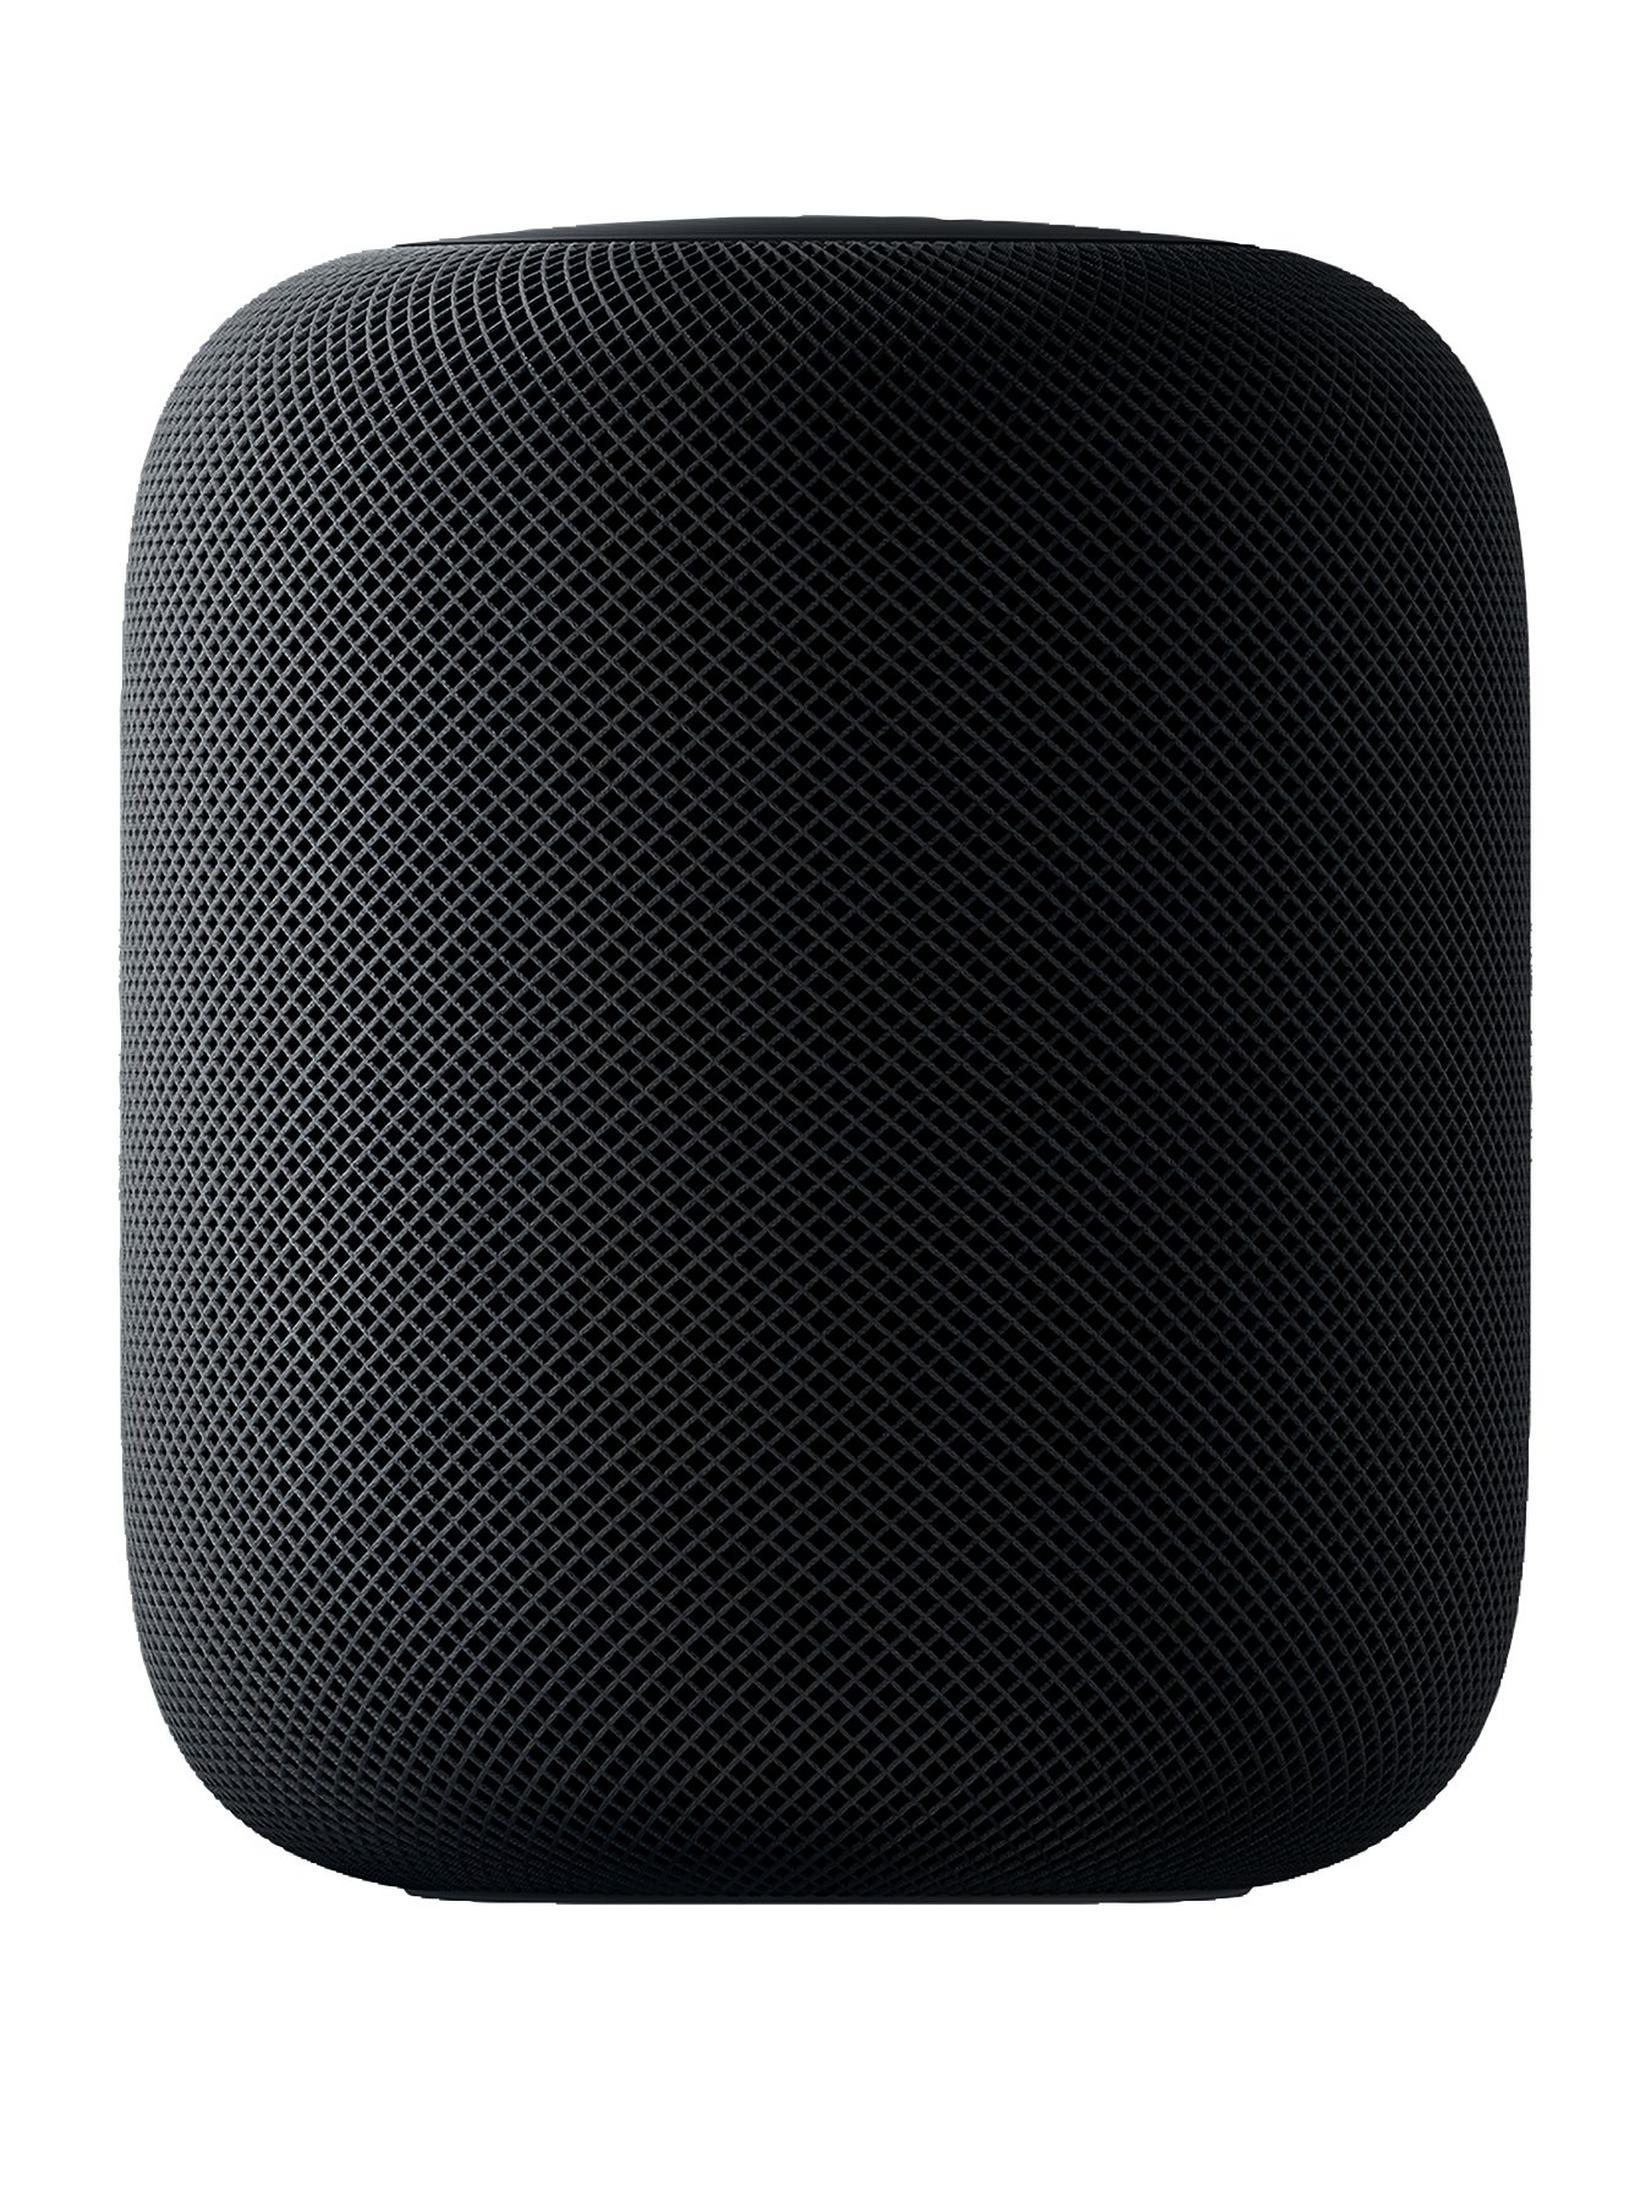 Apple HomePod £229 @ Very using code P7ANV